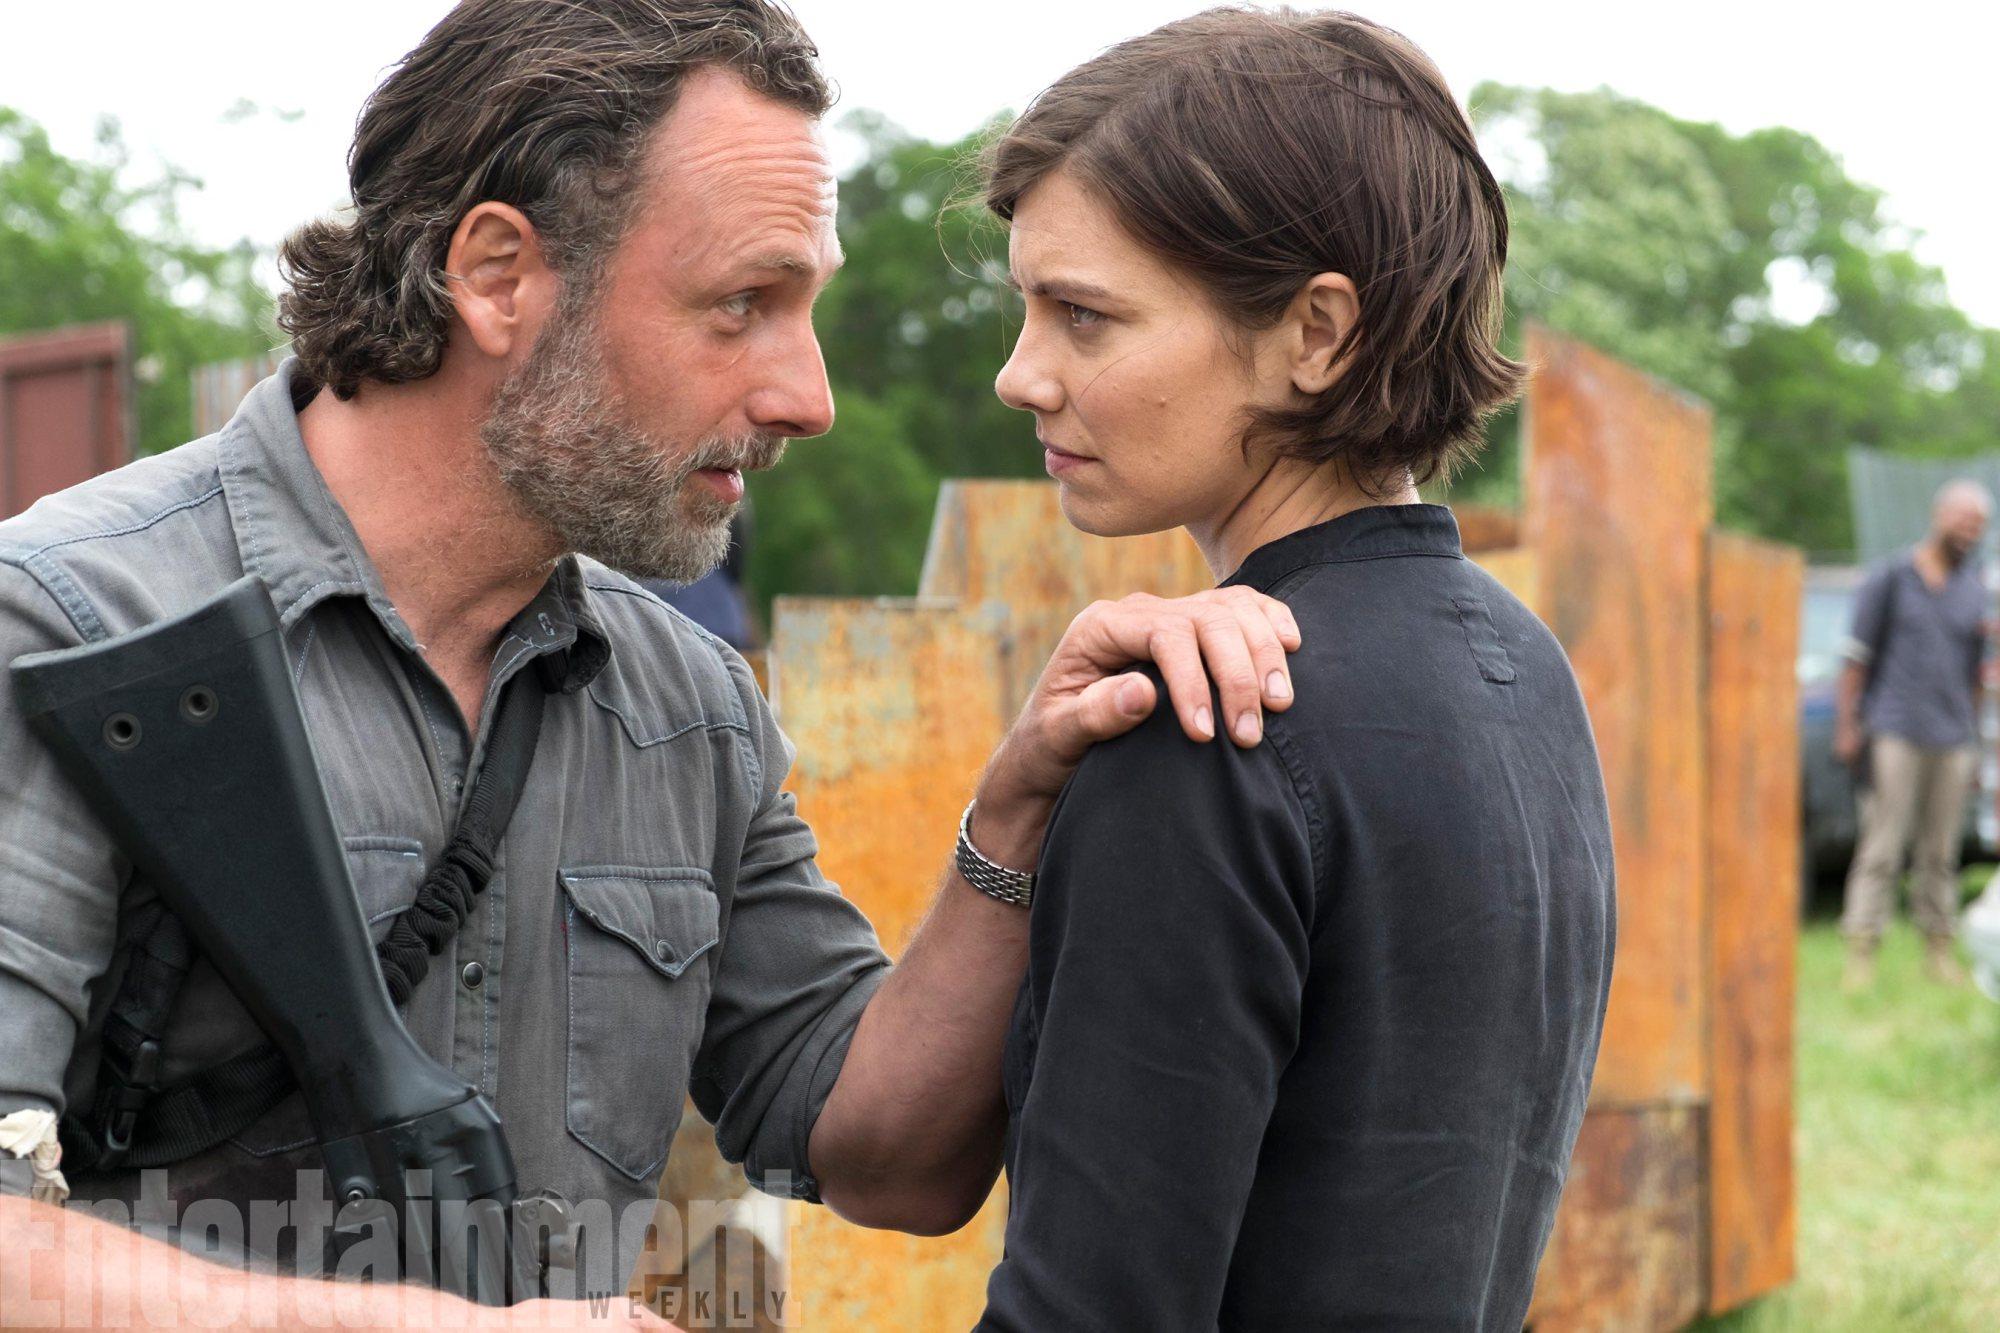 The Walking DeadSeason 8, Episode 1Andrew Lincoln as Rick Grimes, Lauren Cohan as Maggie GreeneÂ